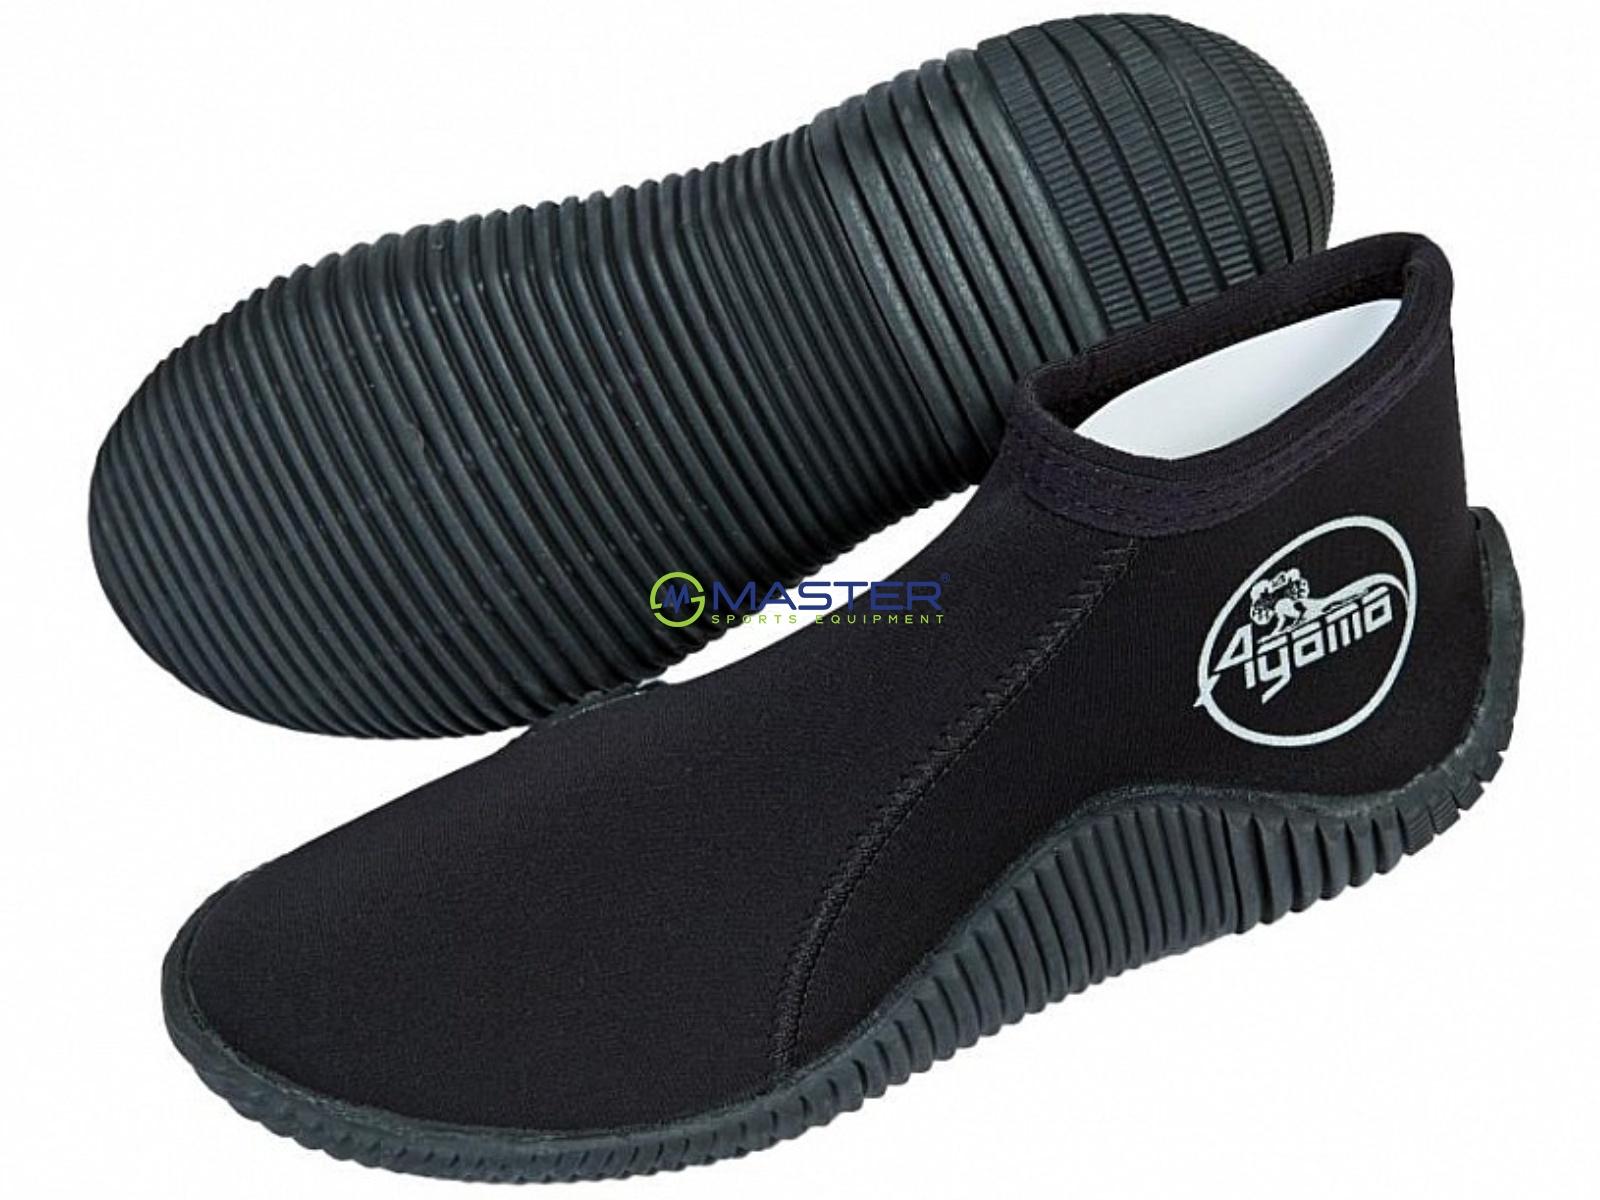 Neoprenové boty AGAMA Rock 3 3f9b0428a3